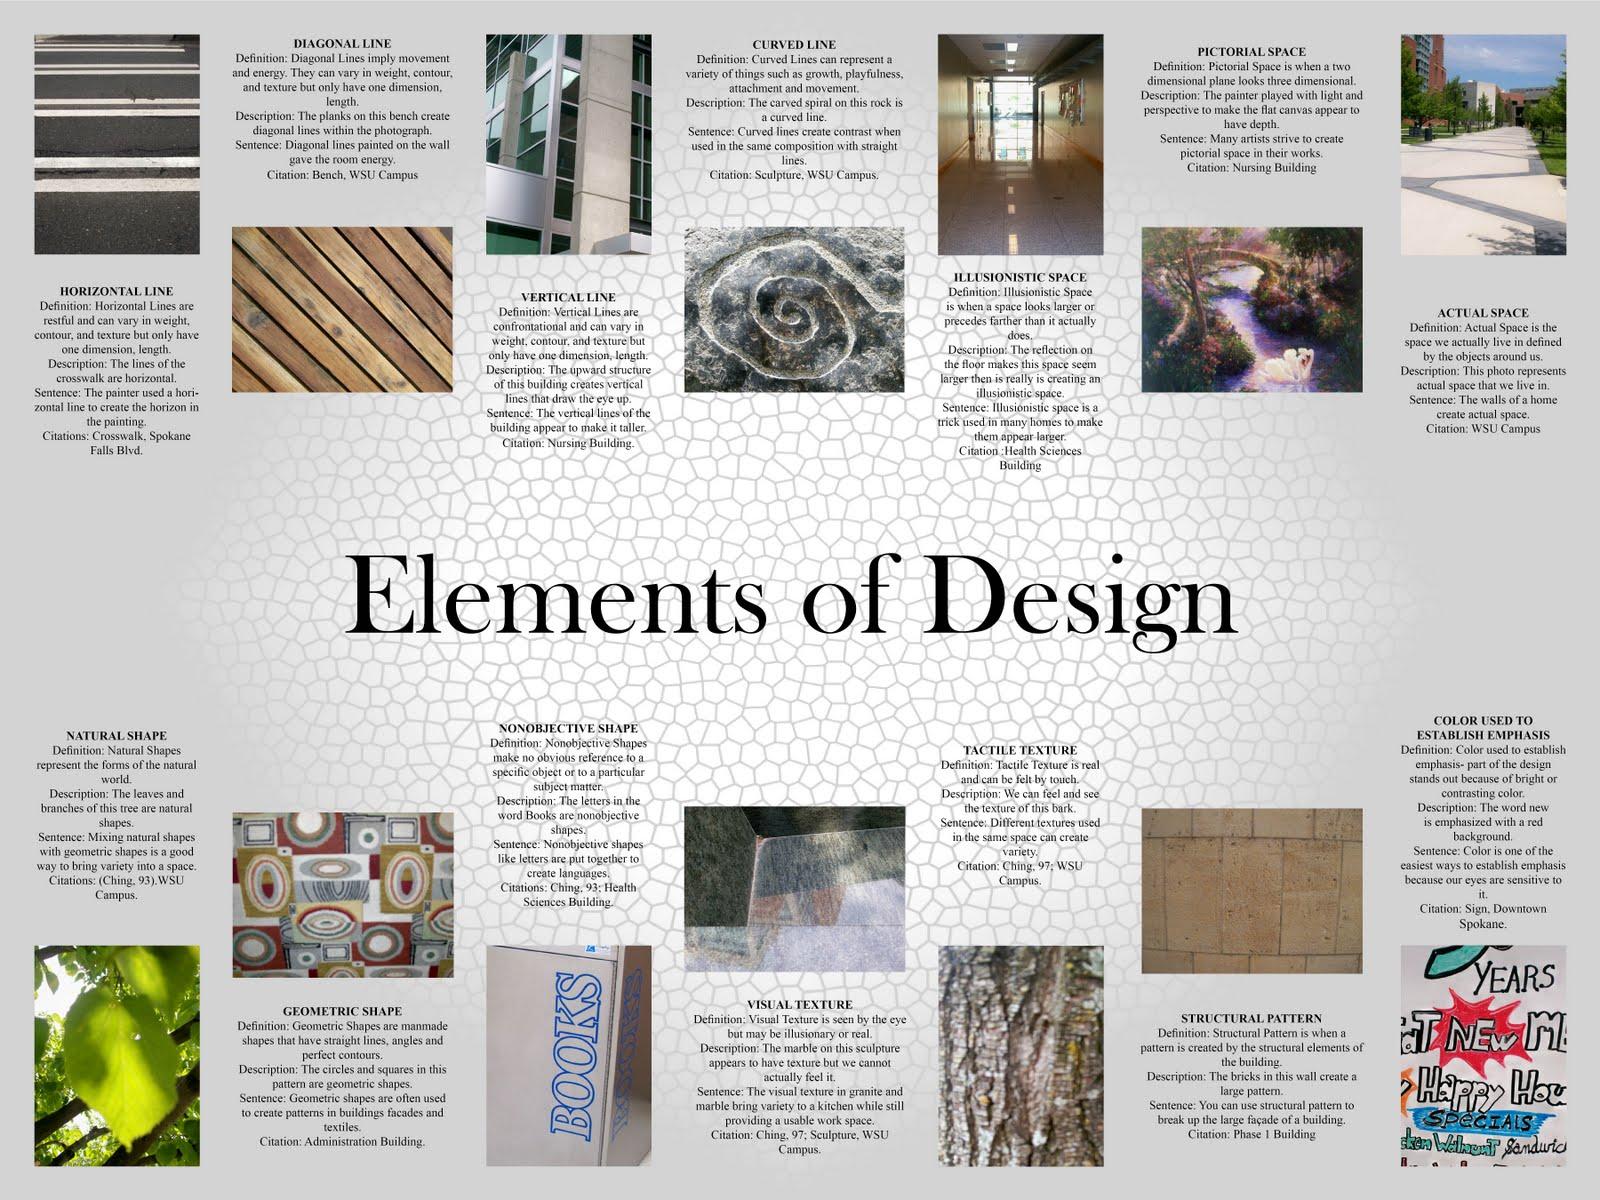 Copy Of Elements Principles Of Design